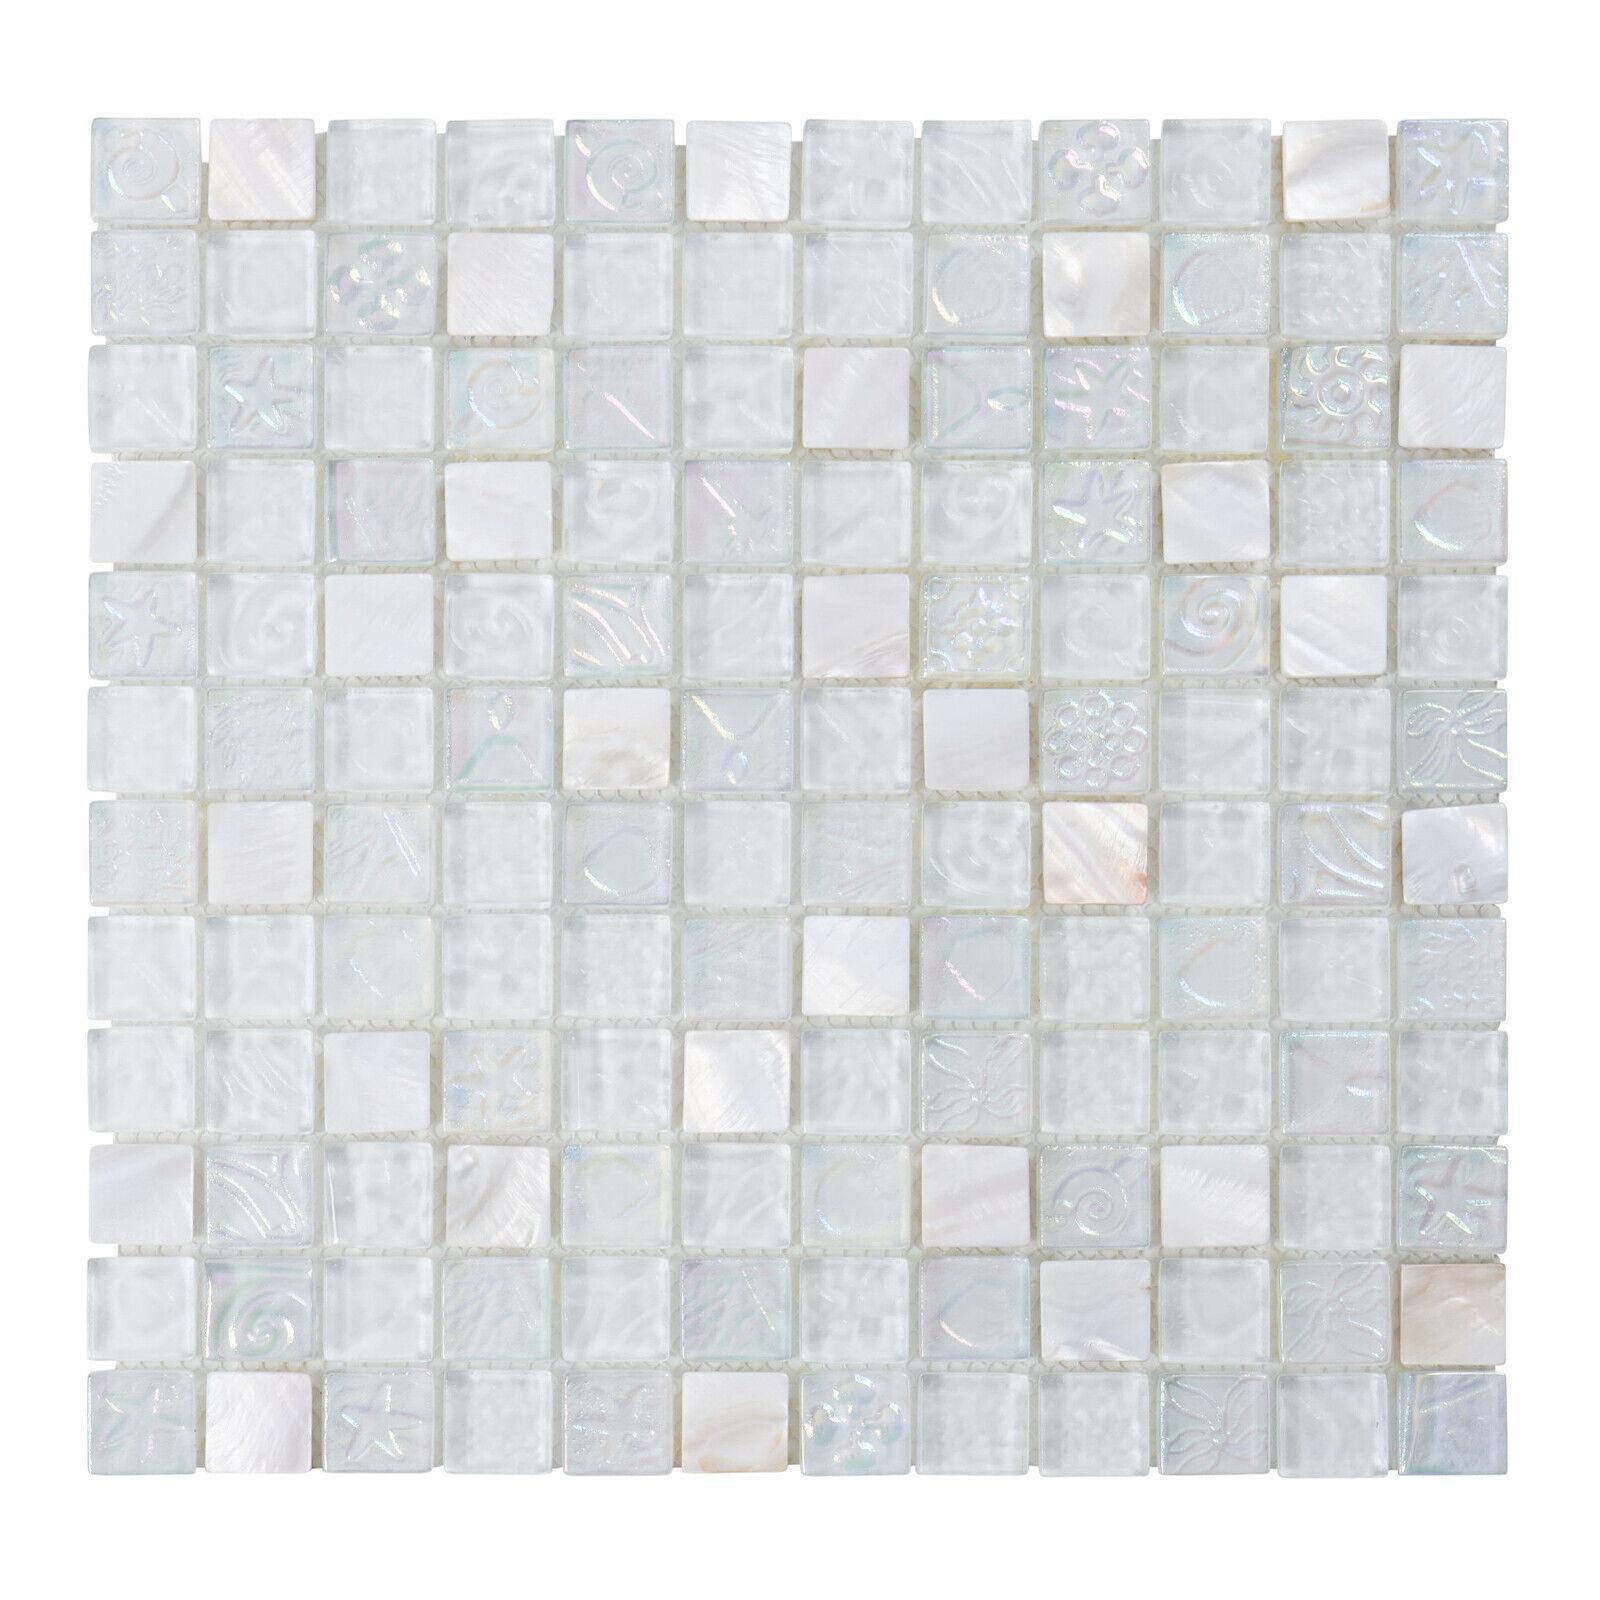 - Sample- Natural White Iridescent Mosaic Tile Kitchen Backsplash